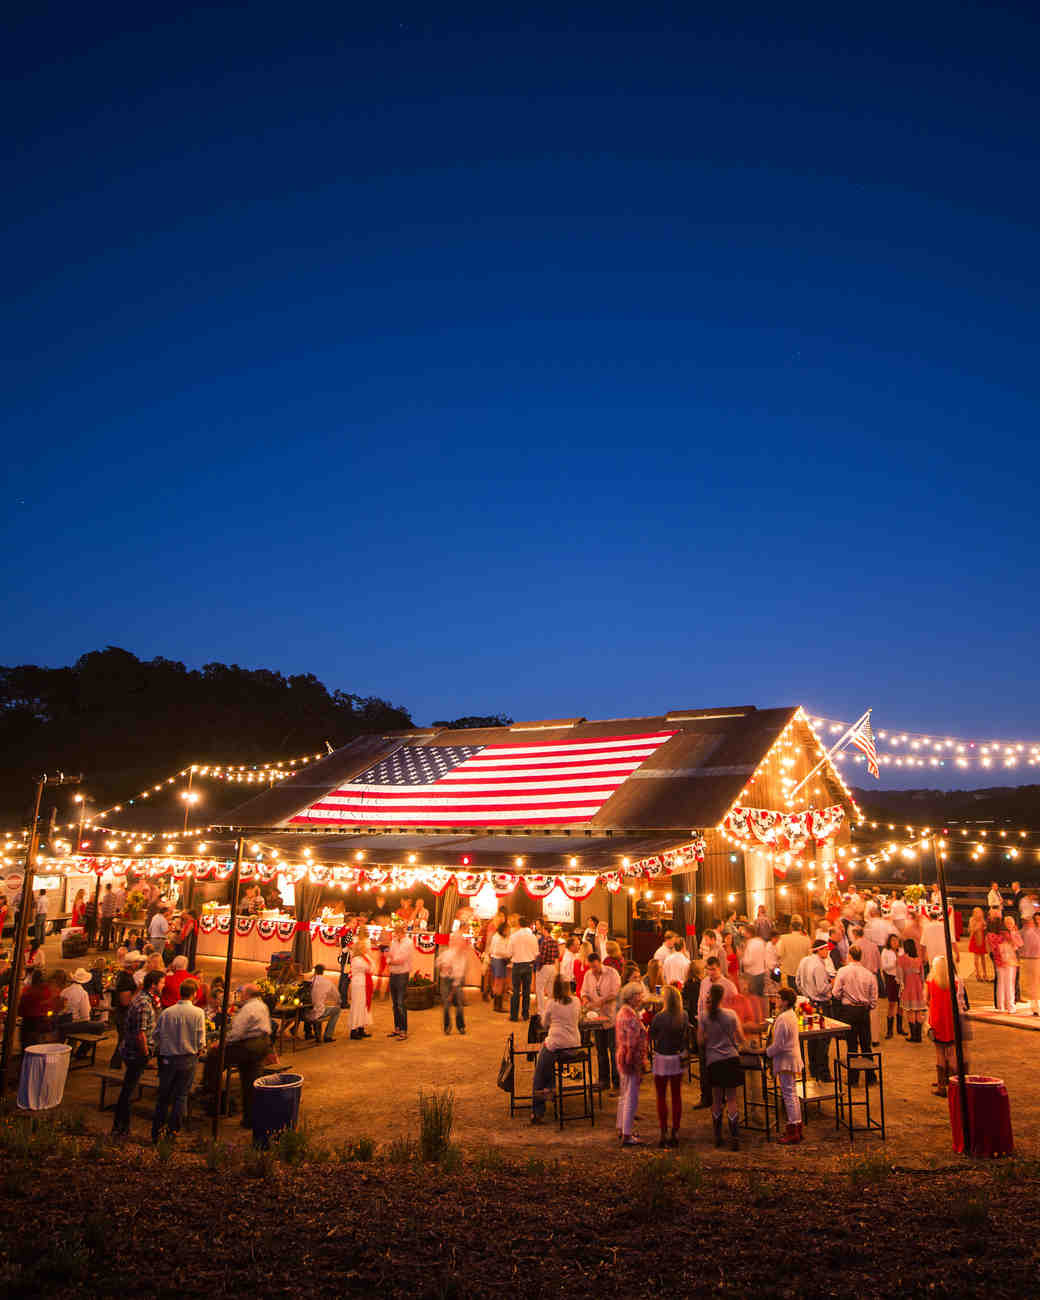 wedding-weekend-ideas-wedding-tent-0416.jpg